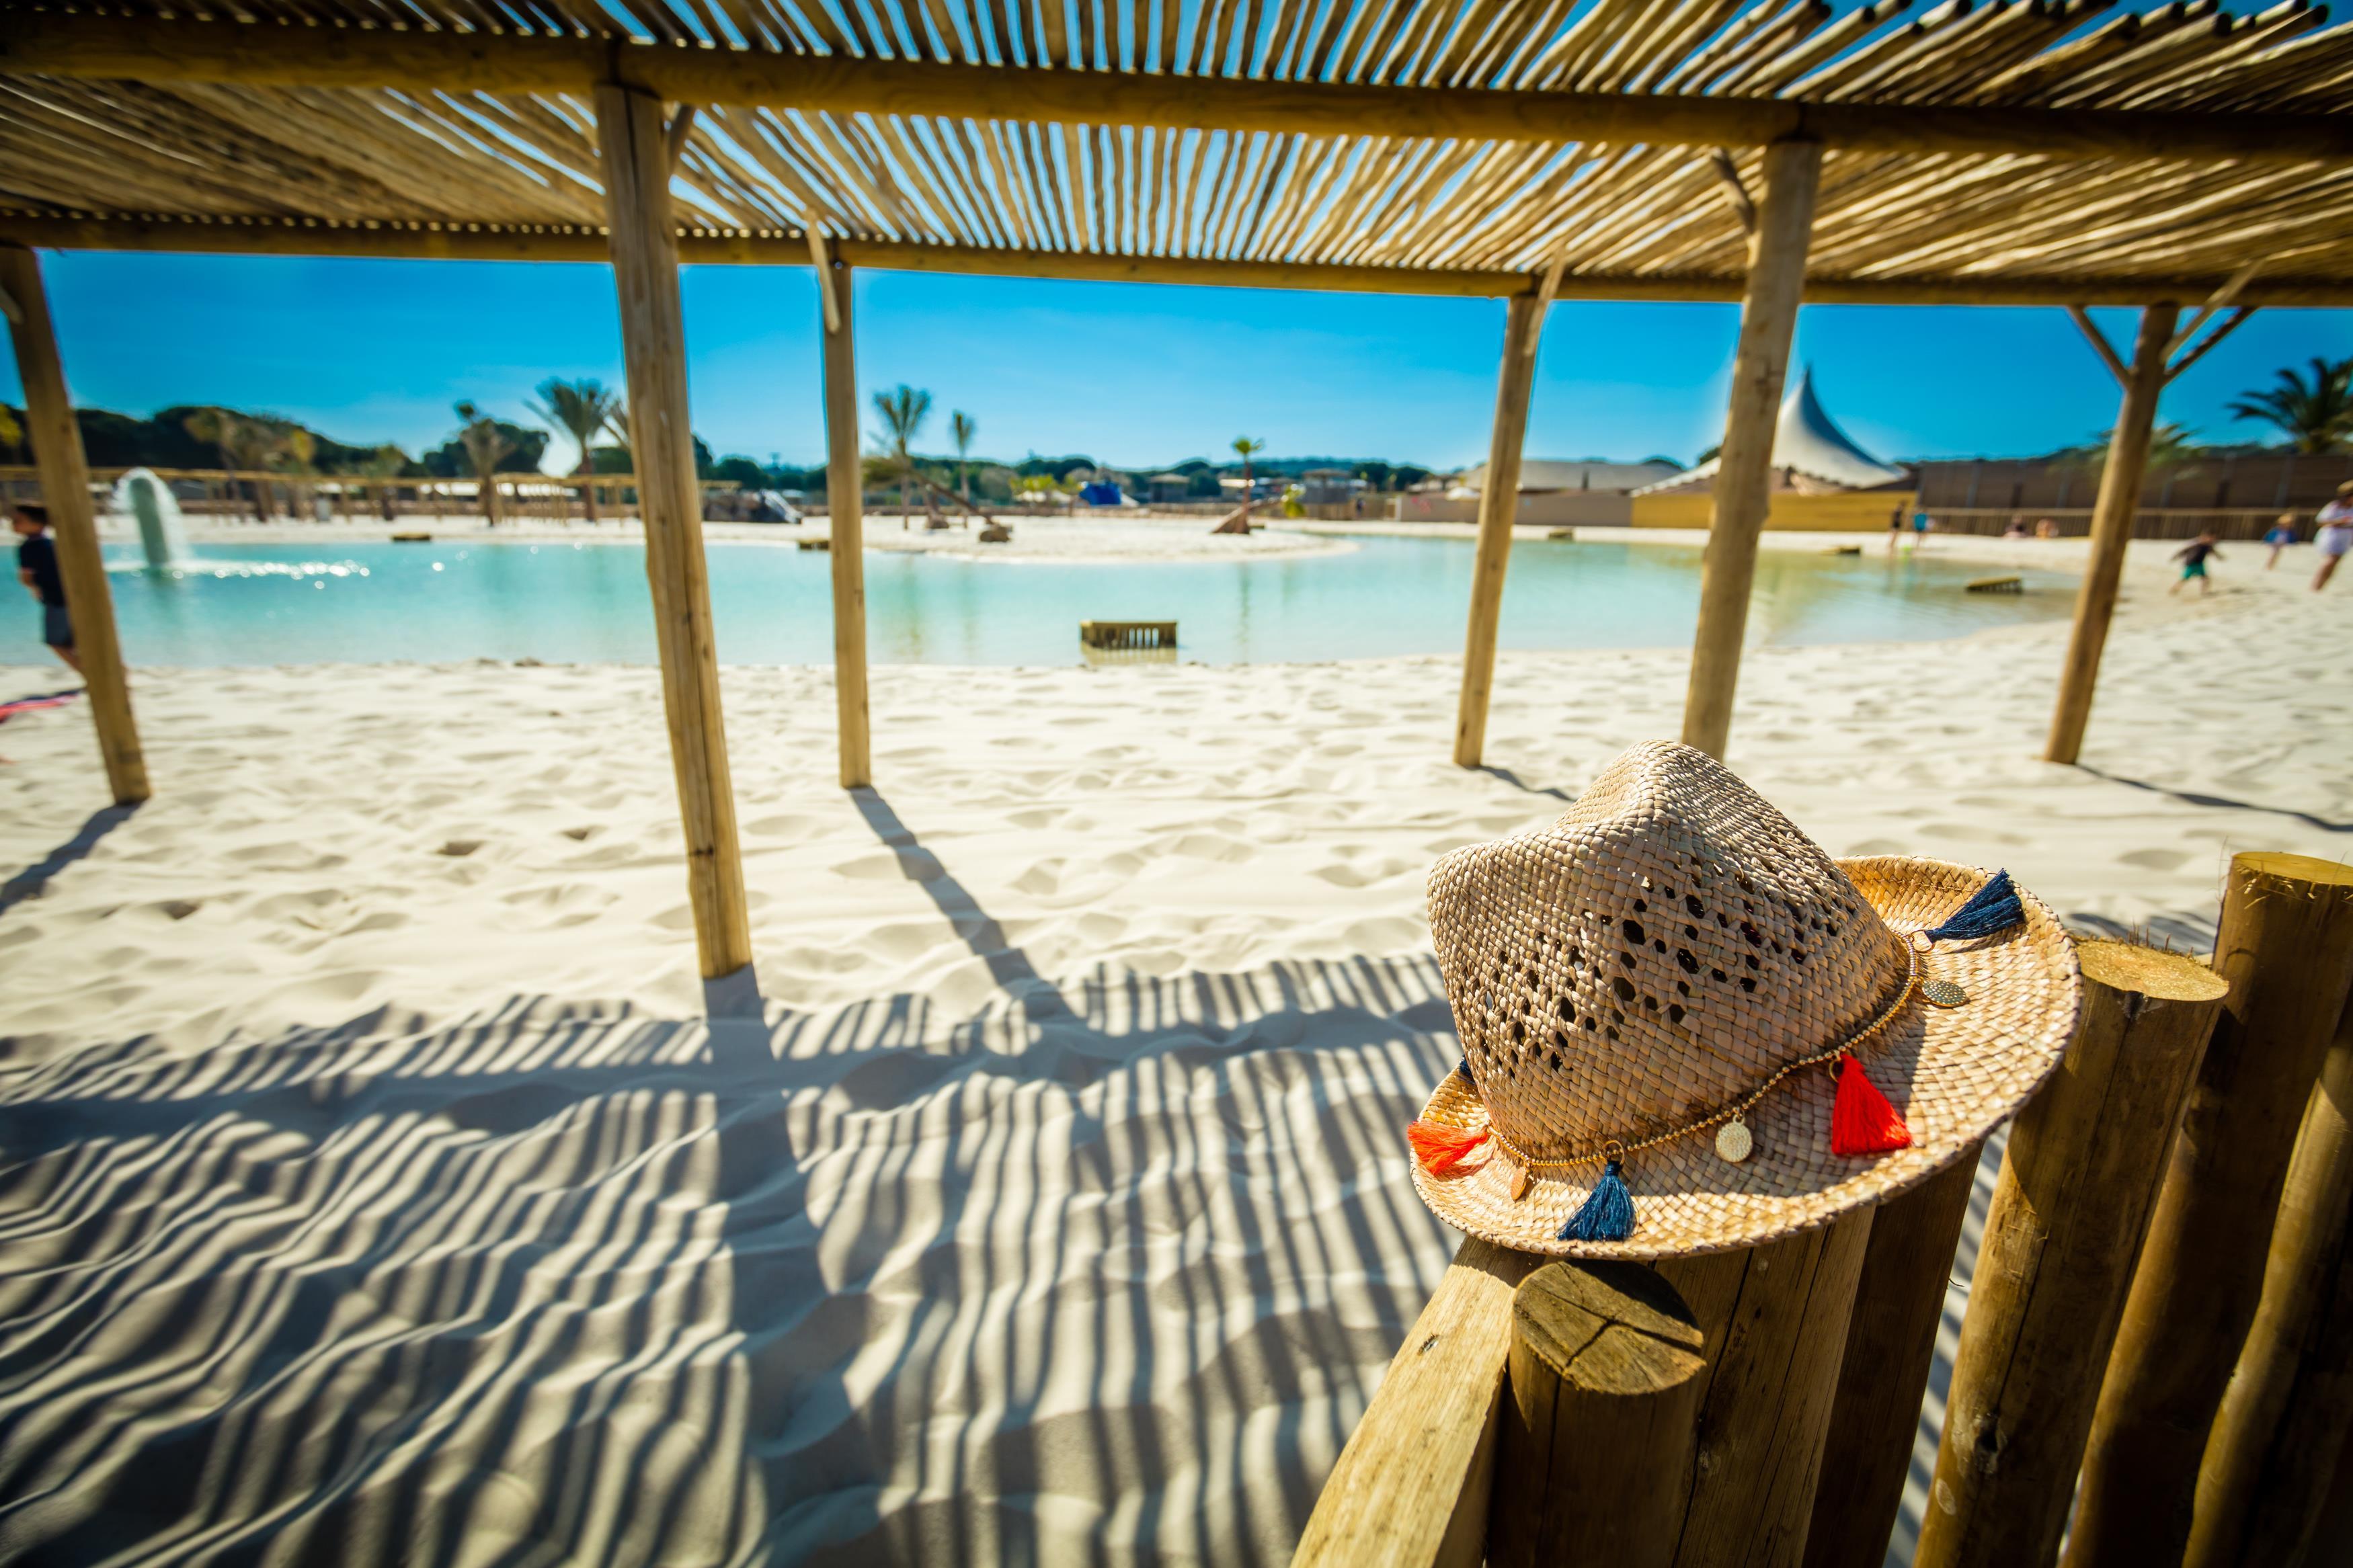 Sunbathing Parasol Pool Beach